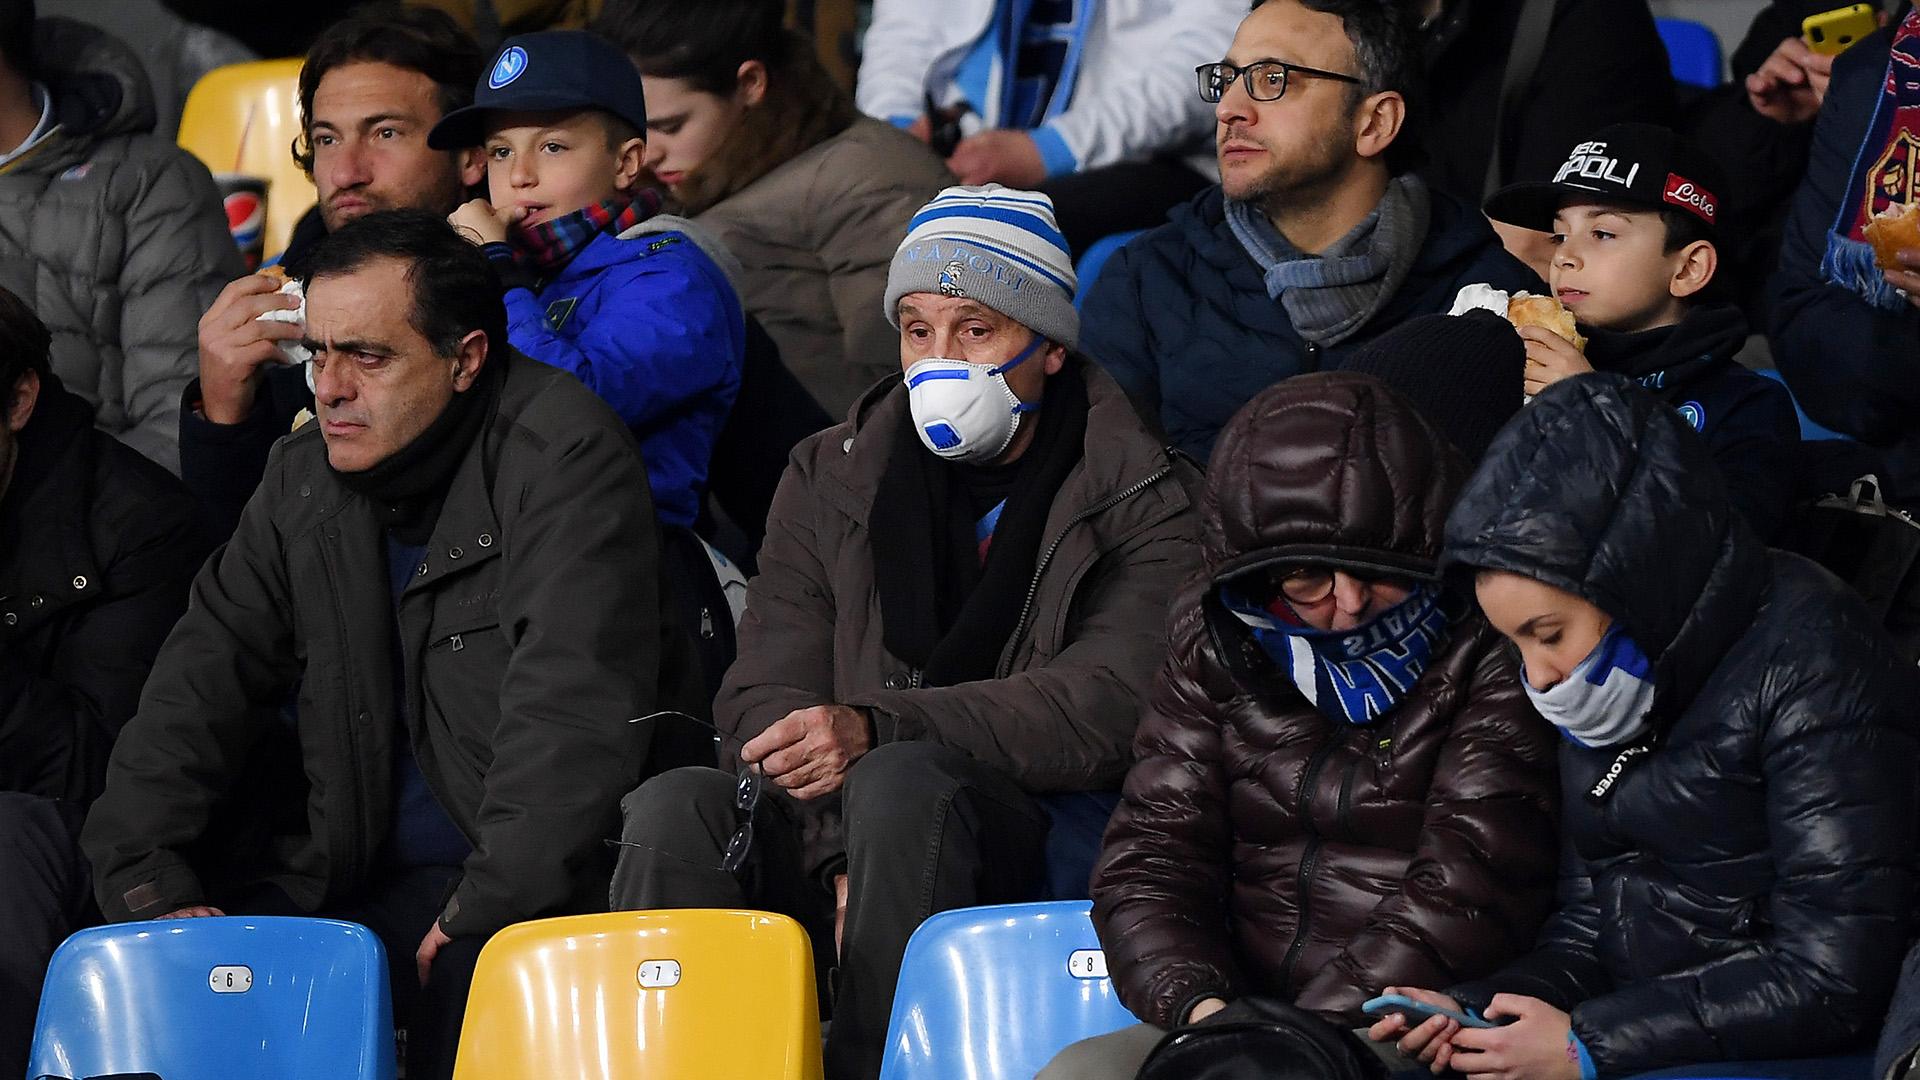 O coronavírus infectou a mente de quem comanda a Serie A italiana